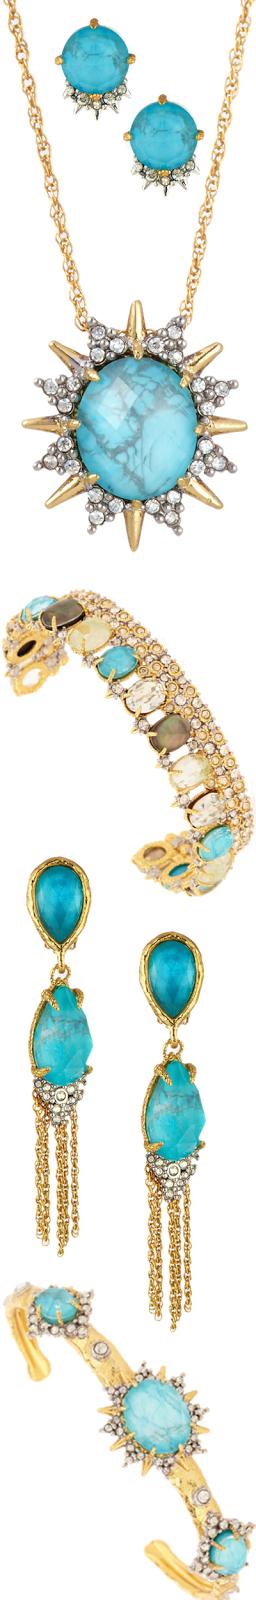 Alexis Bittar Turquoise Jewelry